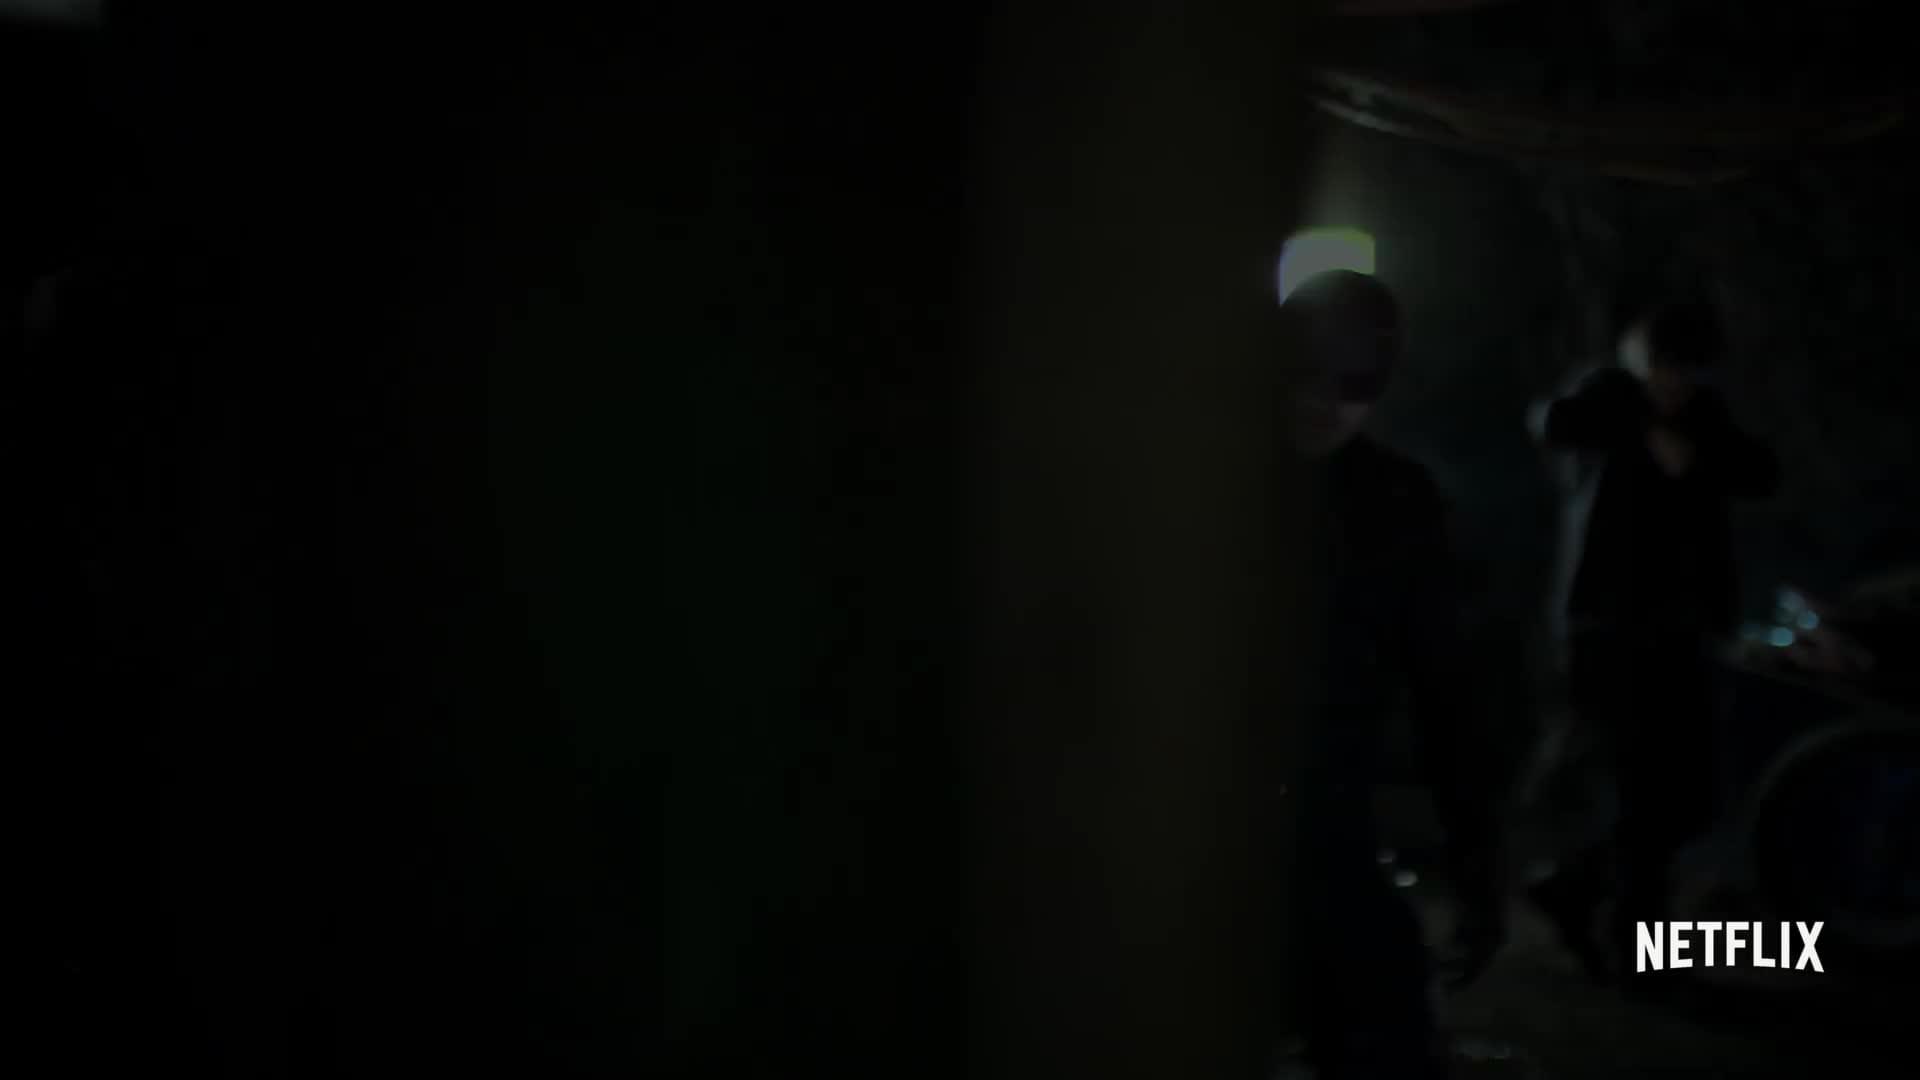 daredevil, defenders, iron fist, jessica jones, luke cage, netflix, playerdotone, the defenders, Marvel's The Defenders | Official Trailer 2 [HD] | Netflix GIFs